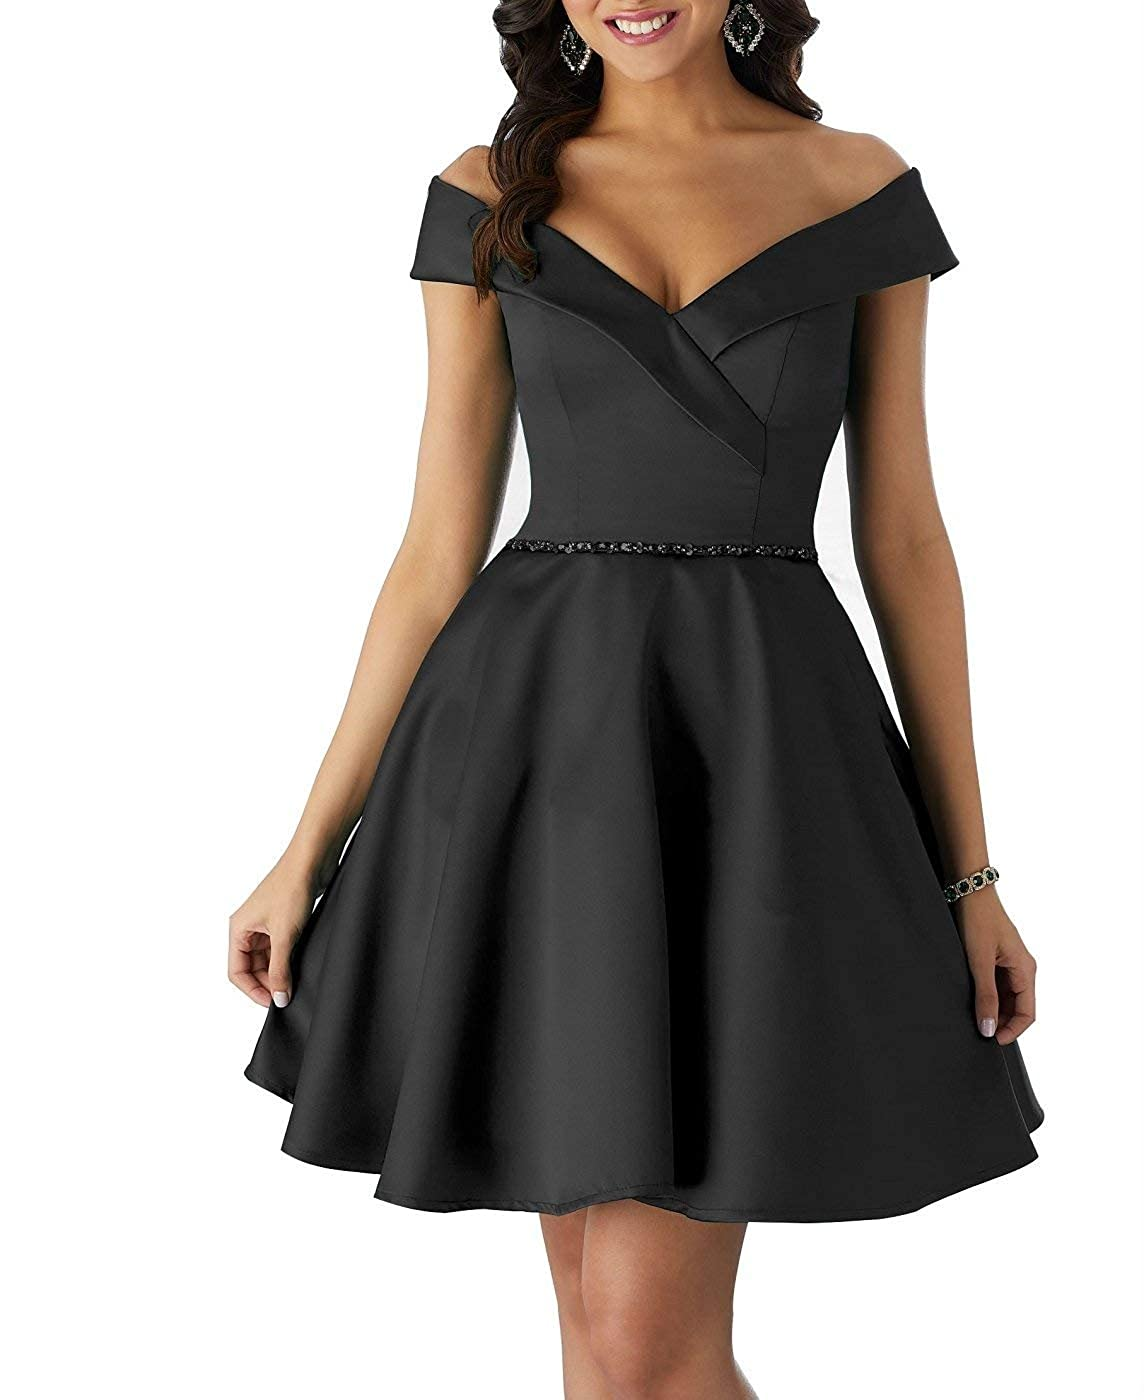 8e05005c36b Short Semi Formal Dresses Amazon - Gomes Weine AG